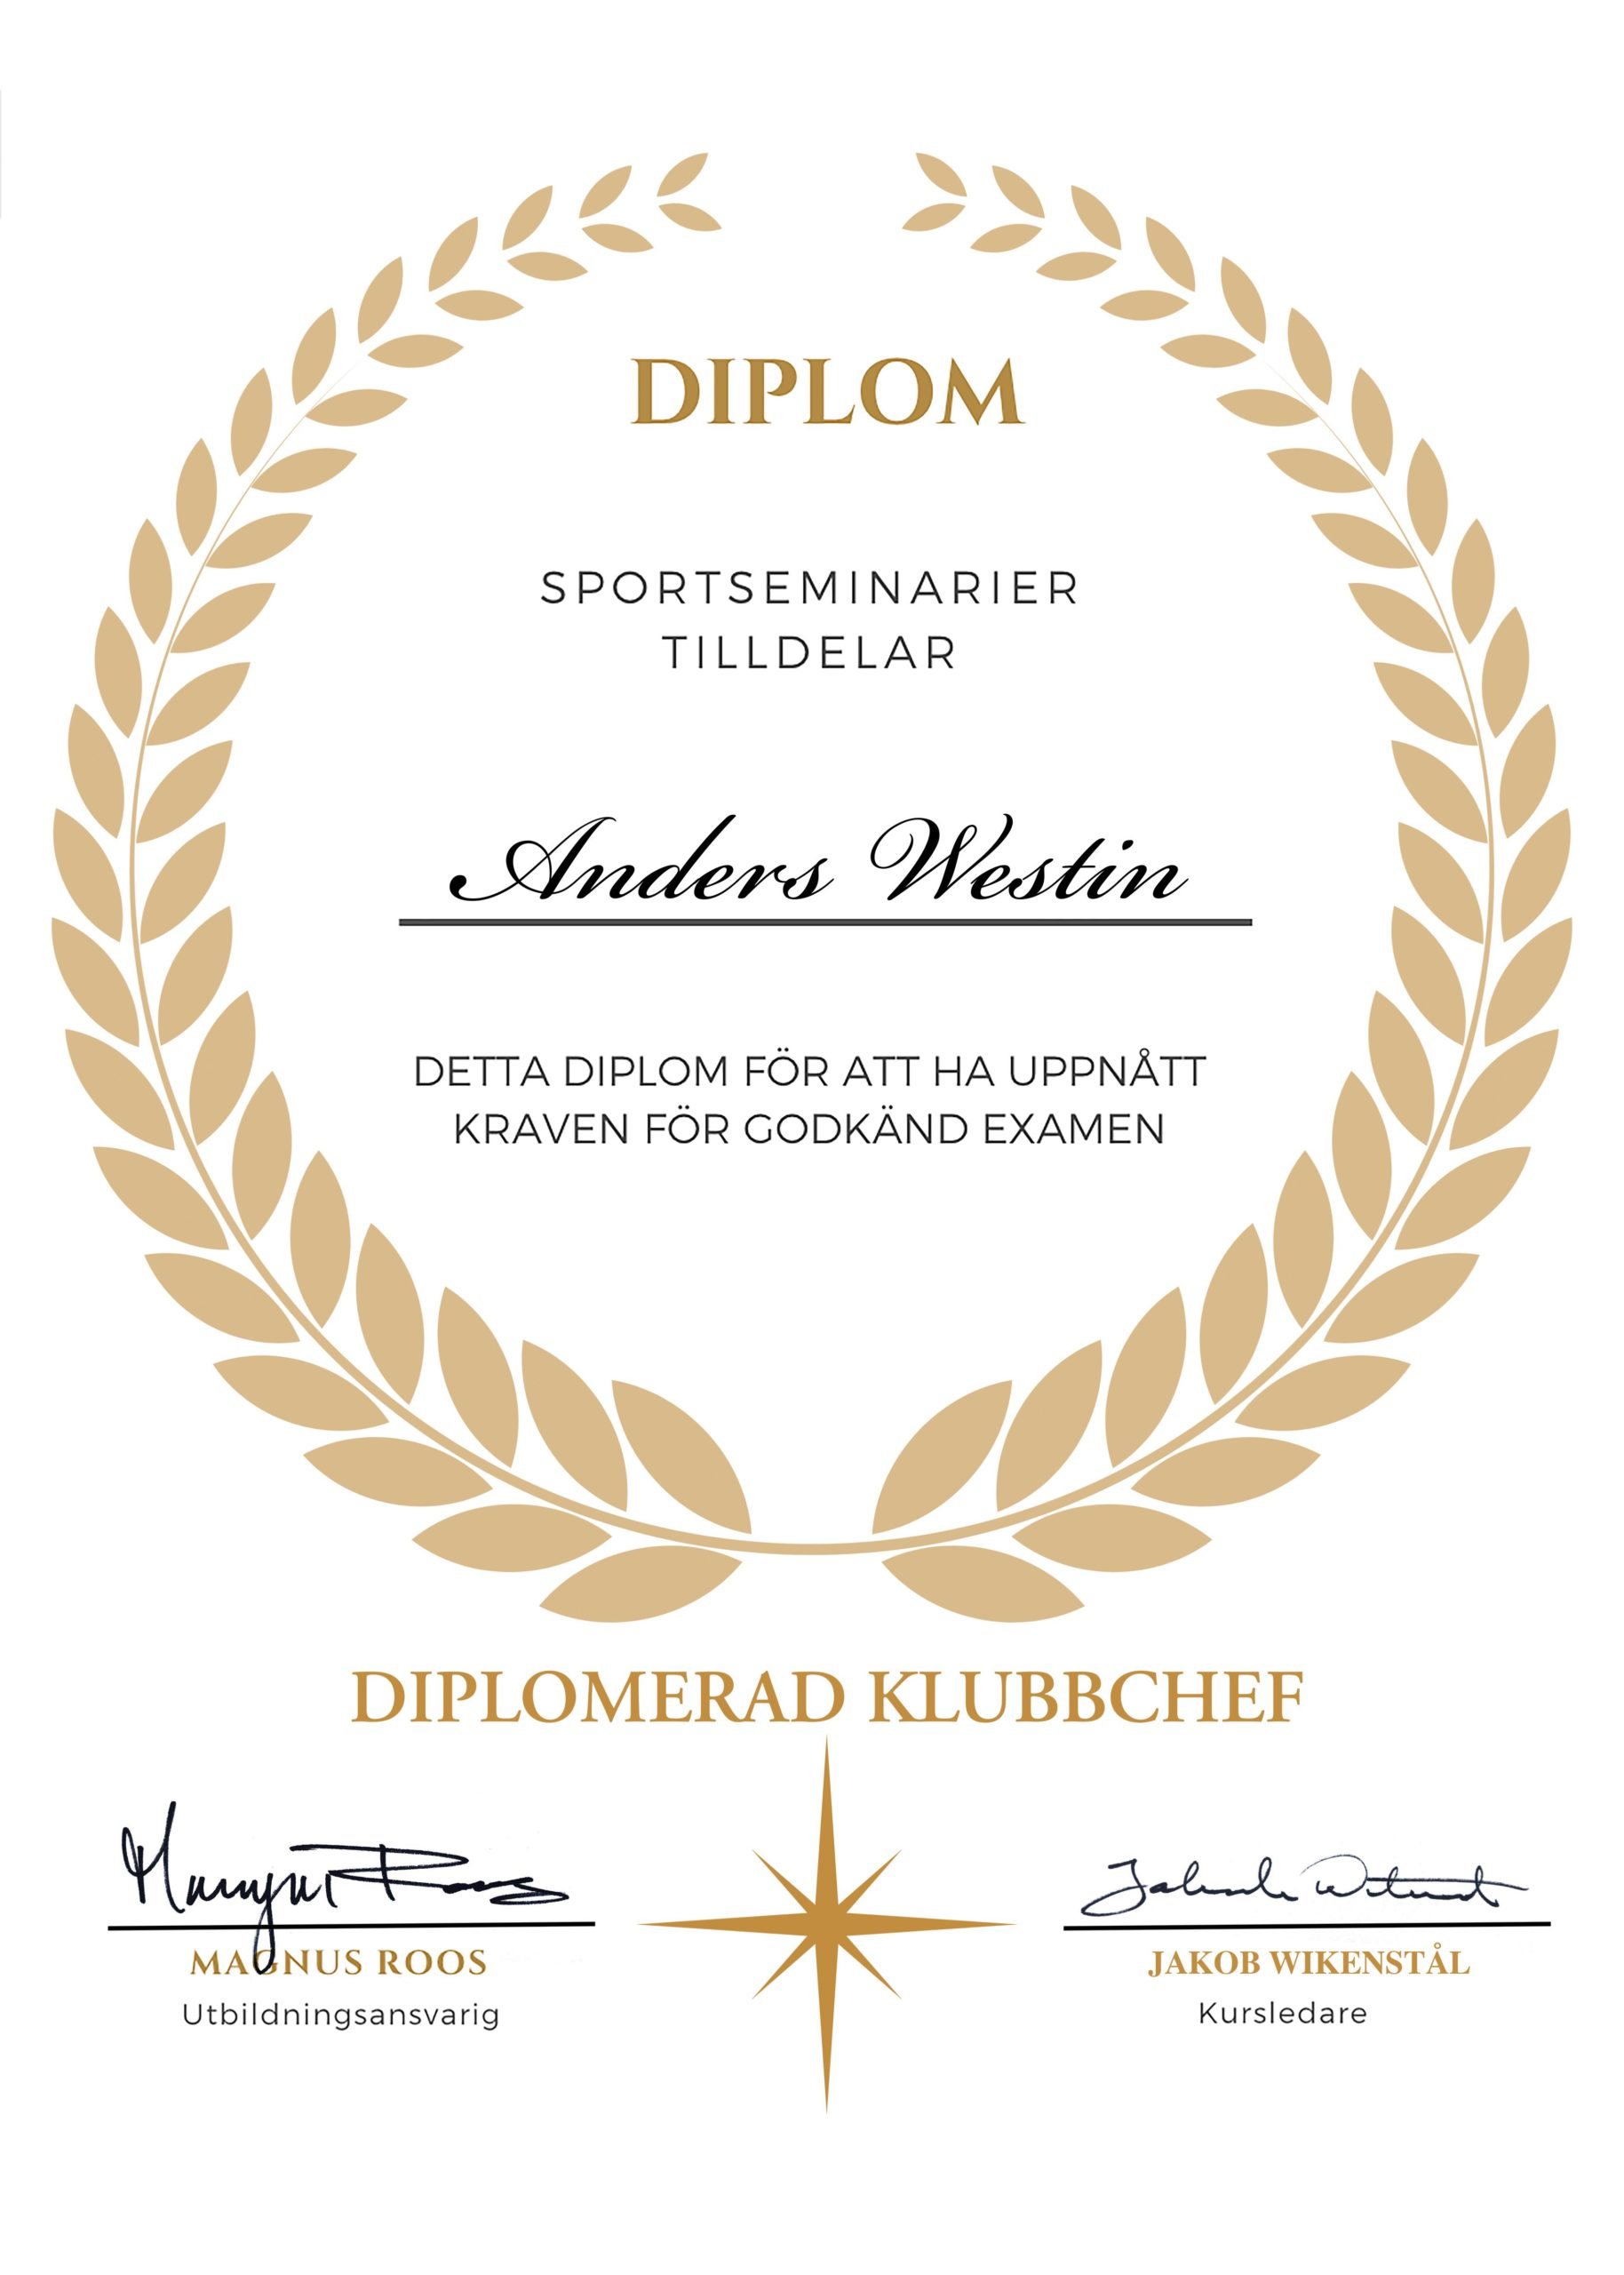 Diplomerad Klubbchef Diplom